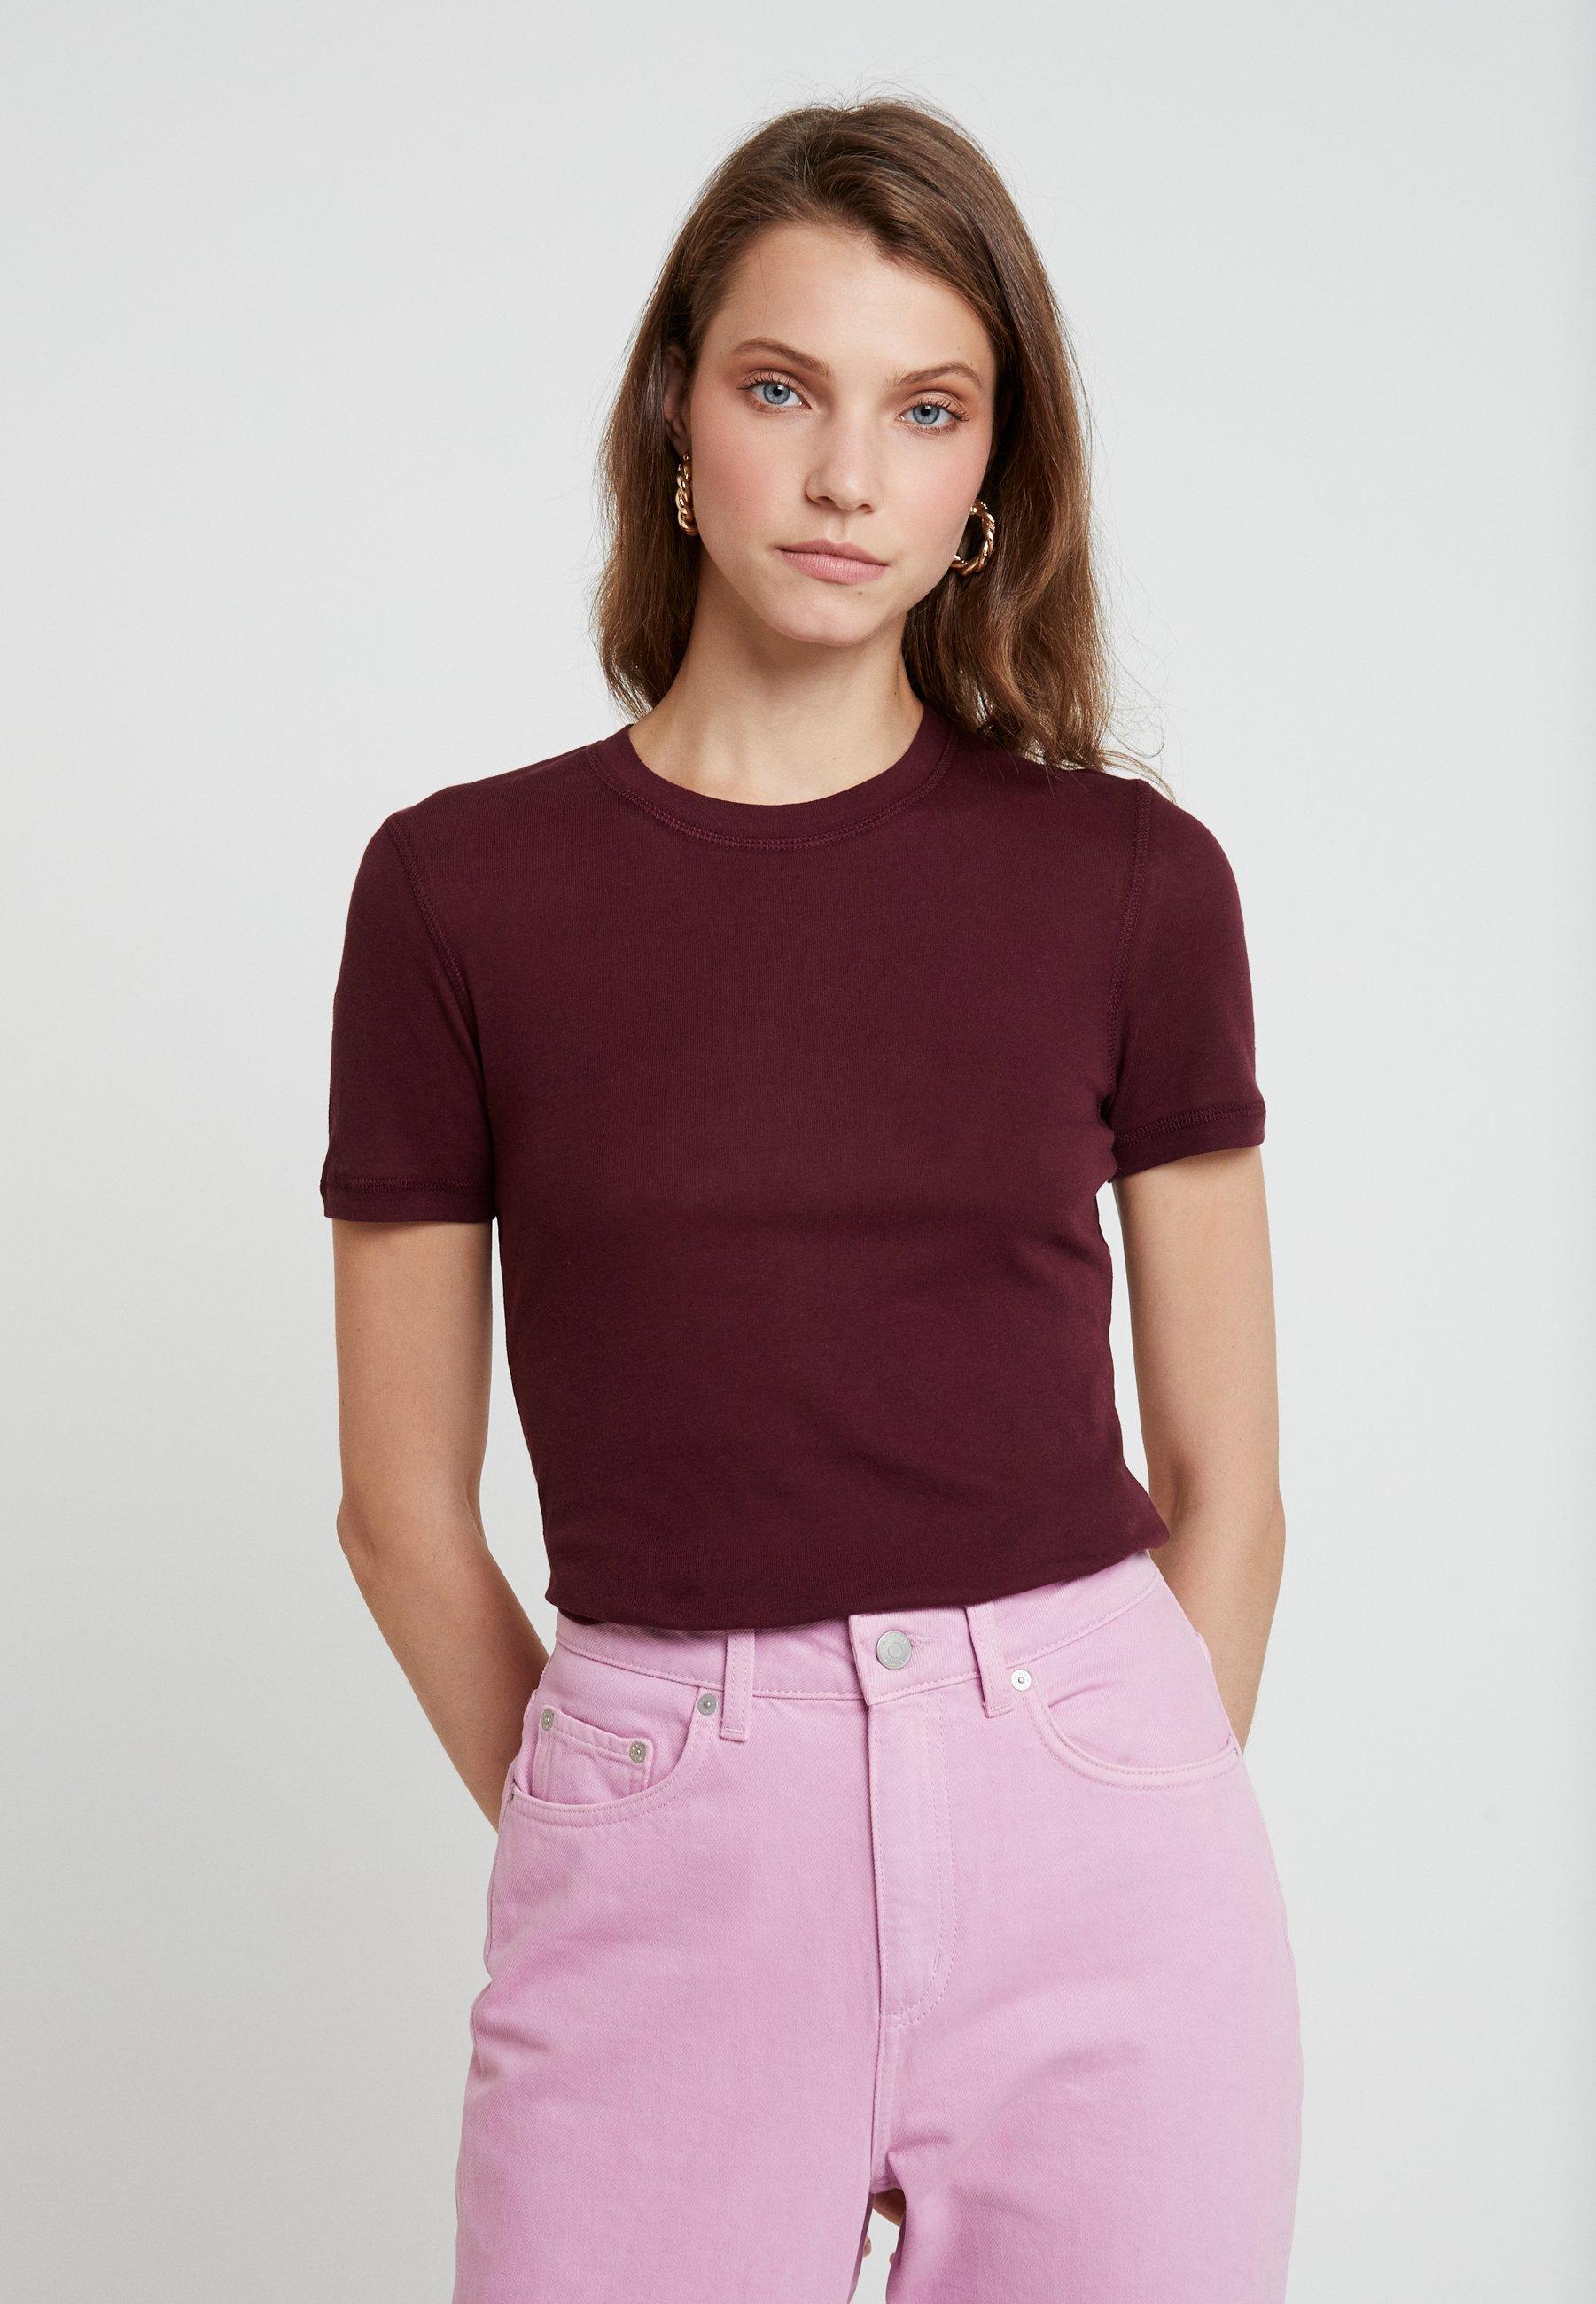 Port Basique Samsøeamp; Royale shirt EsterT N0nwm8